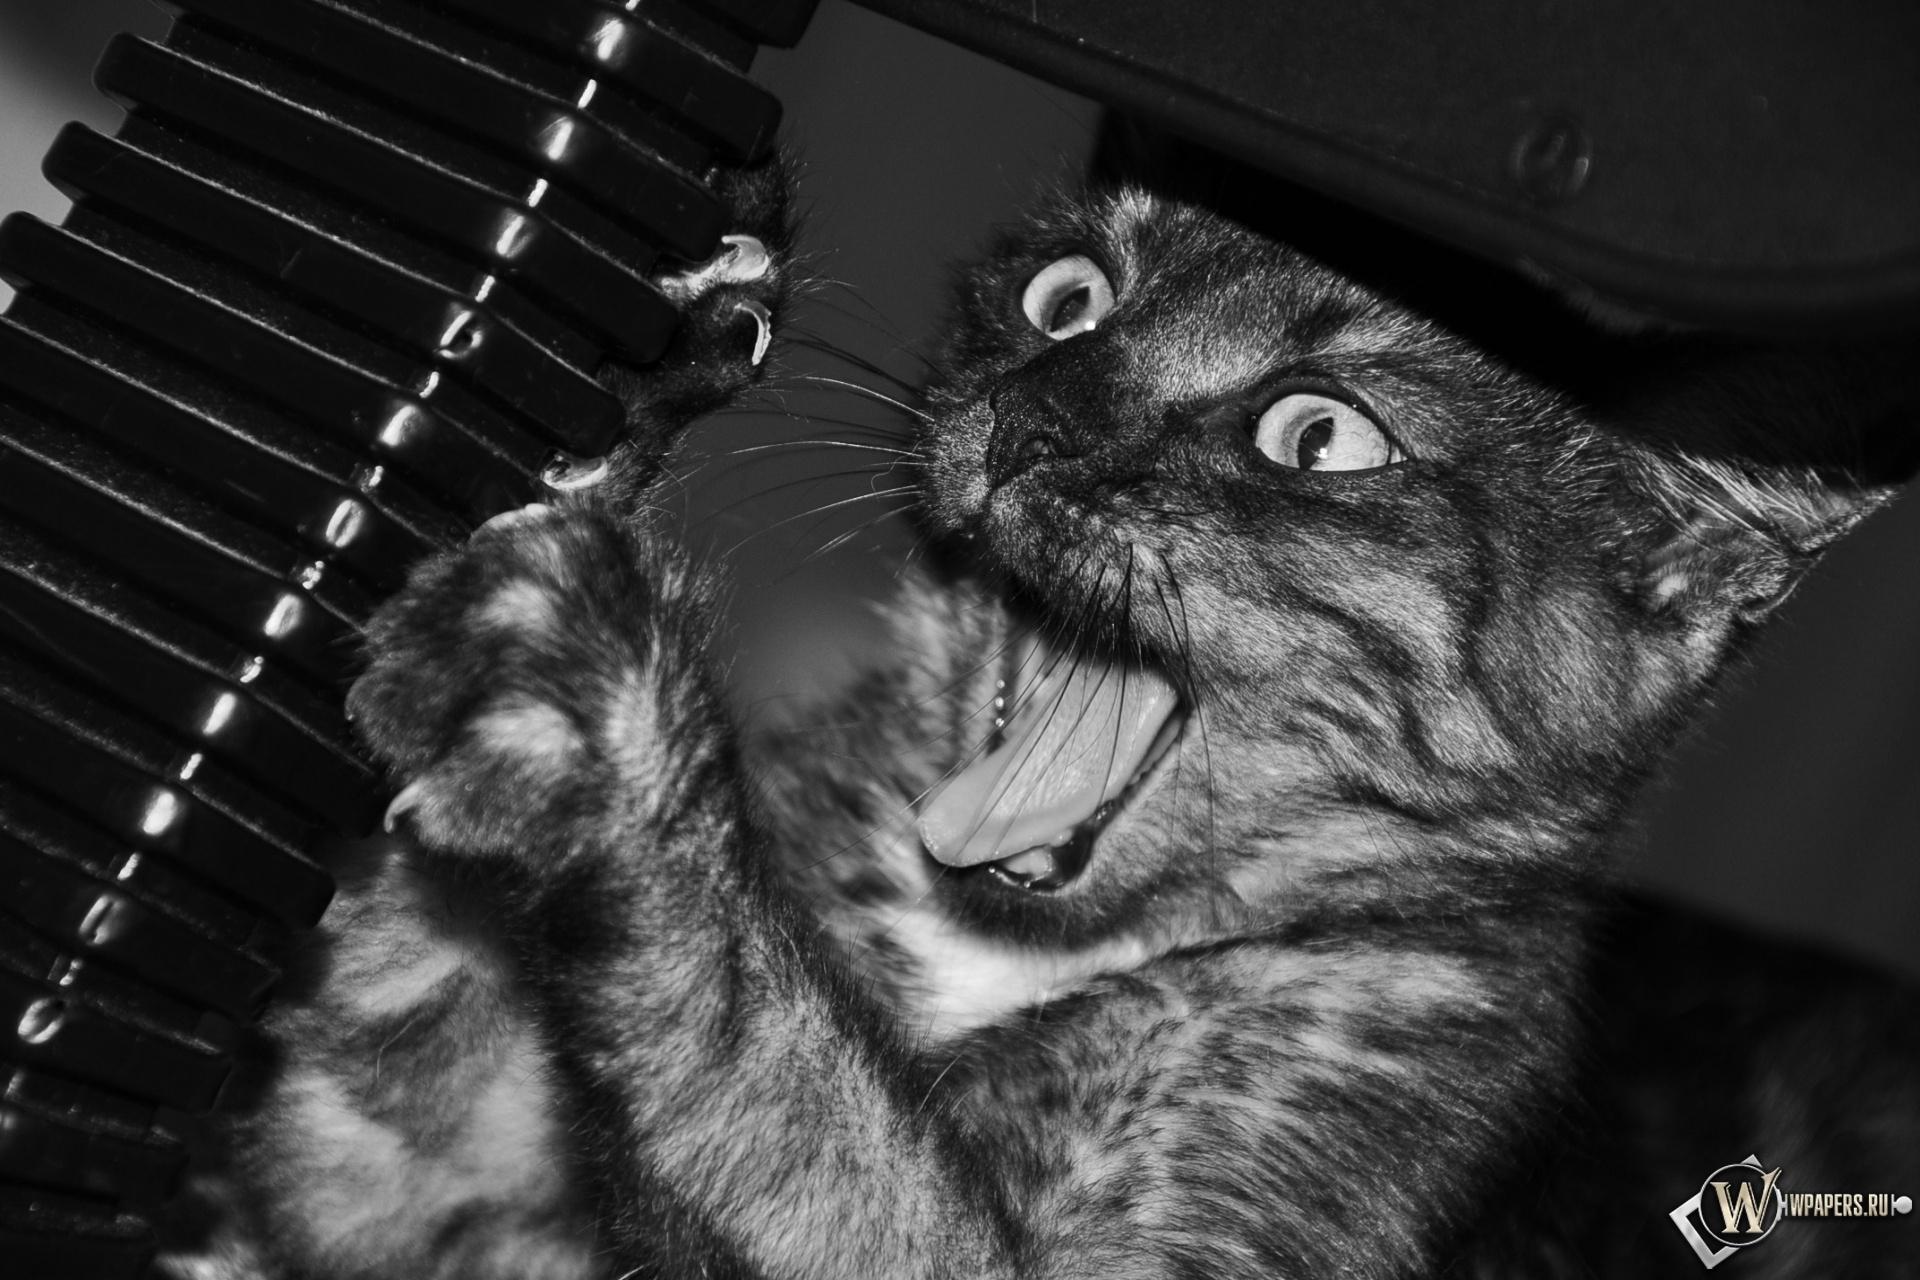 Котик точит когти 1920x1280